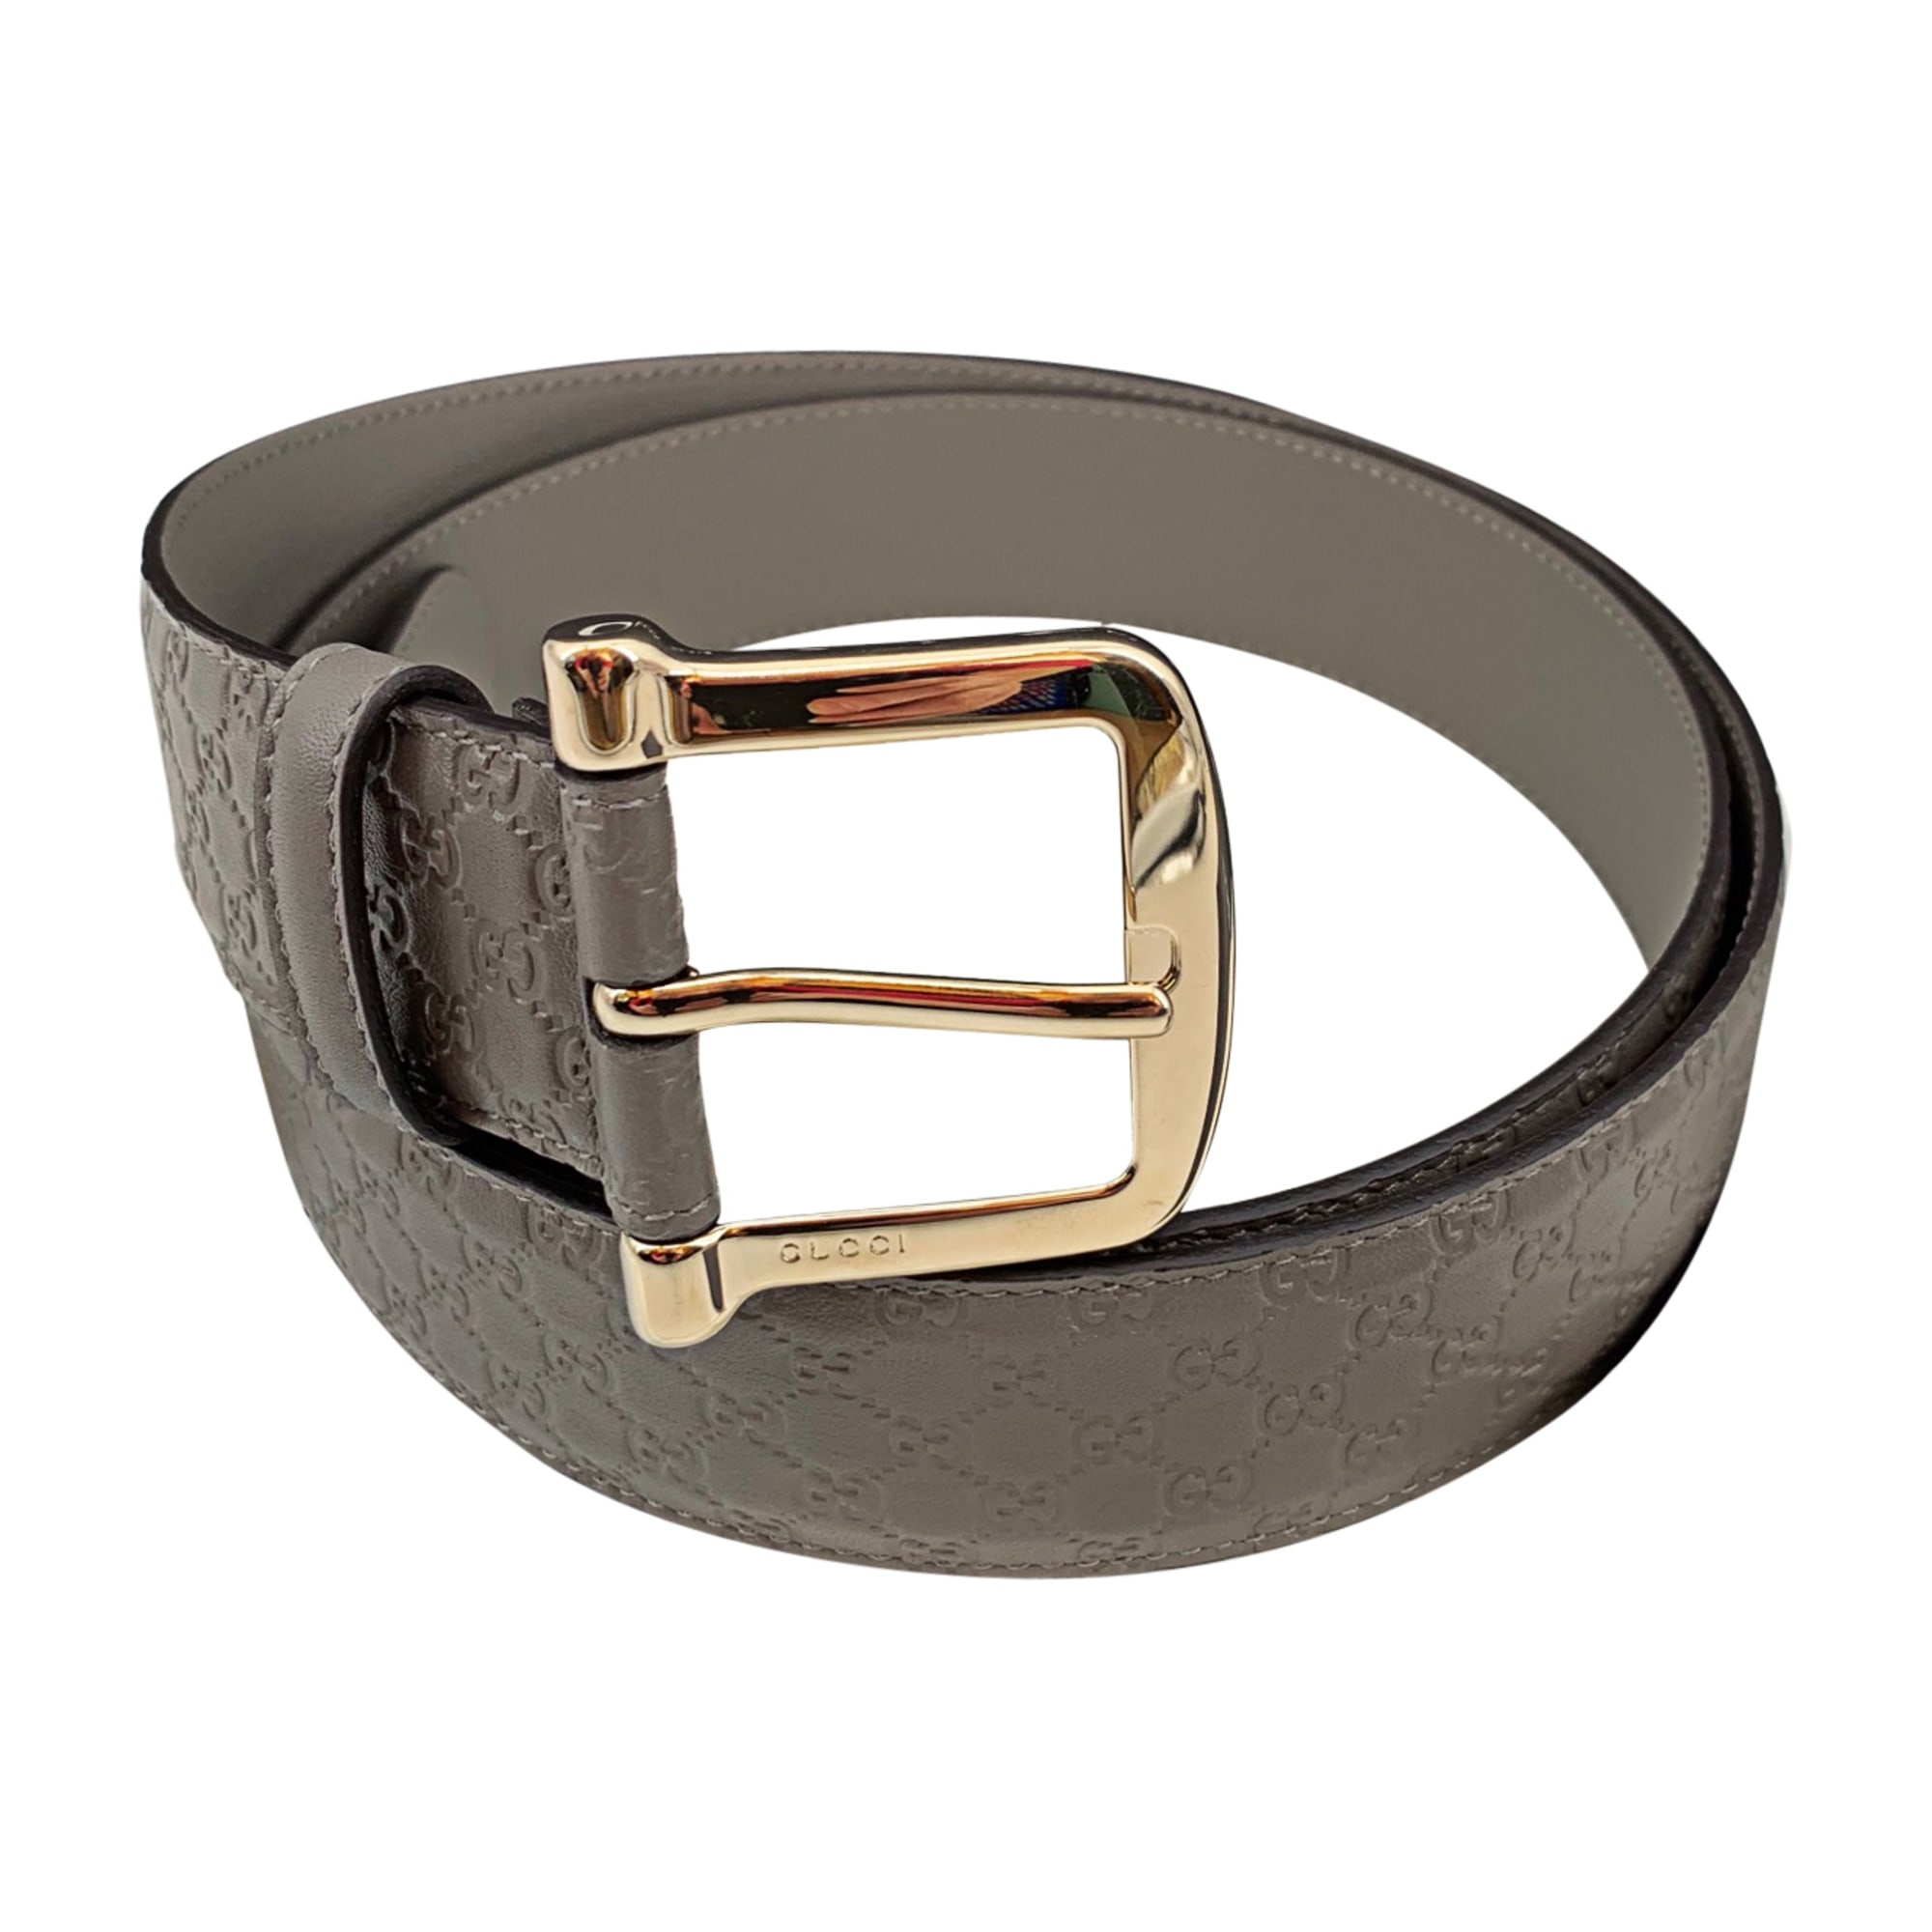 Wide Belt GUCCI Gray, charcoal